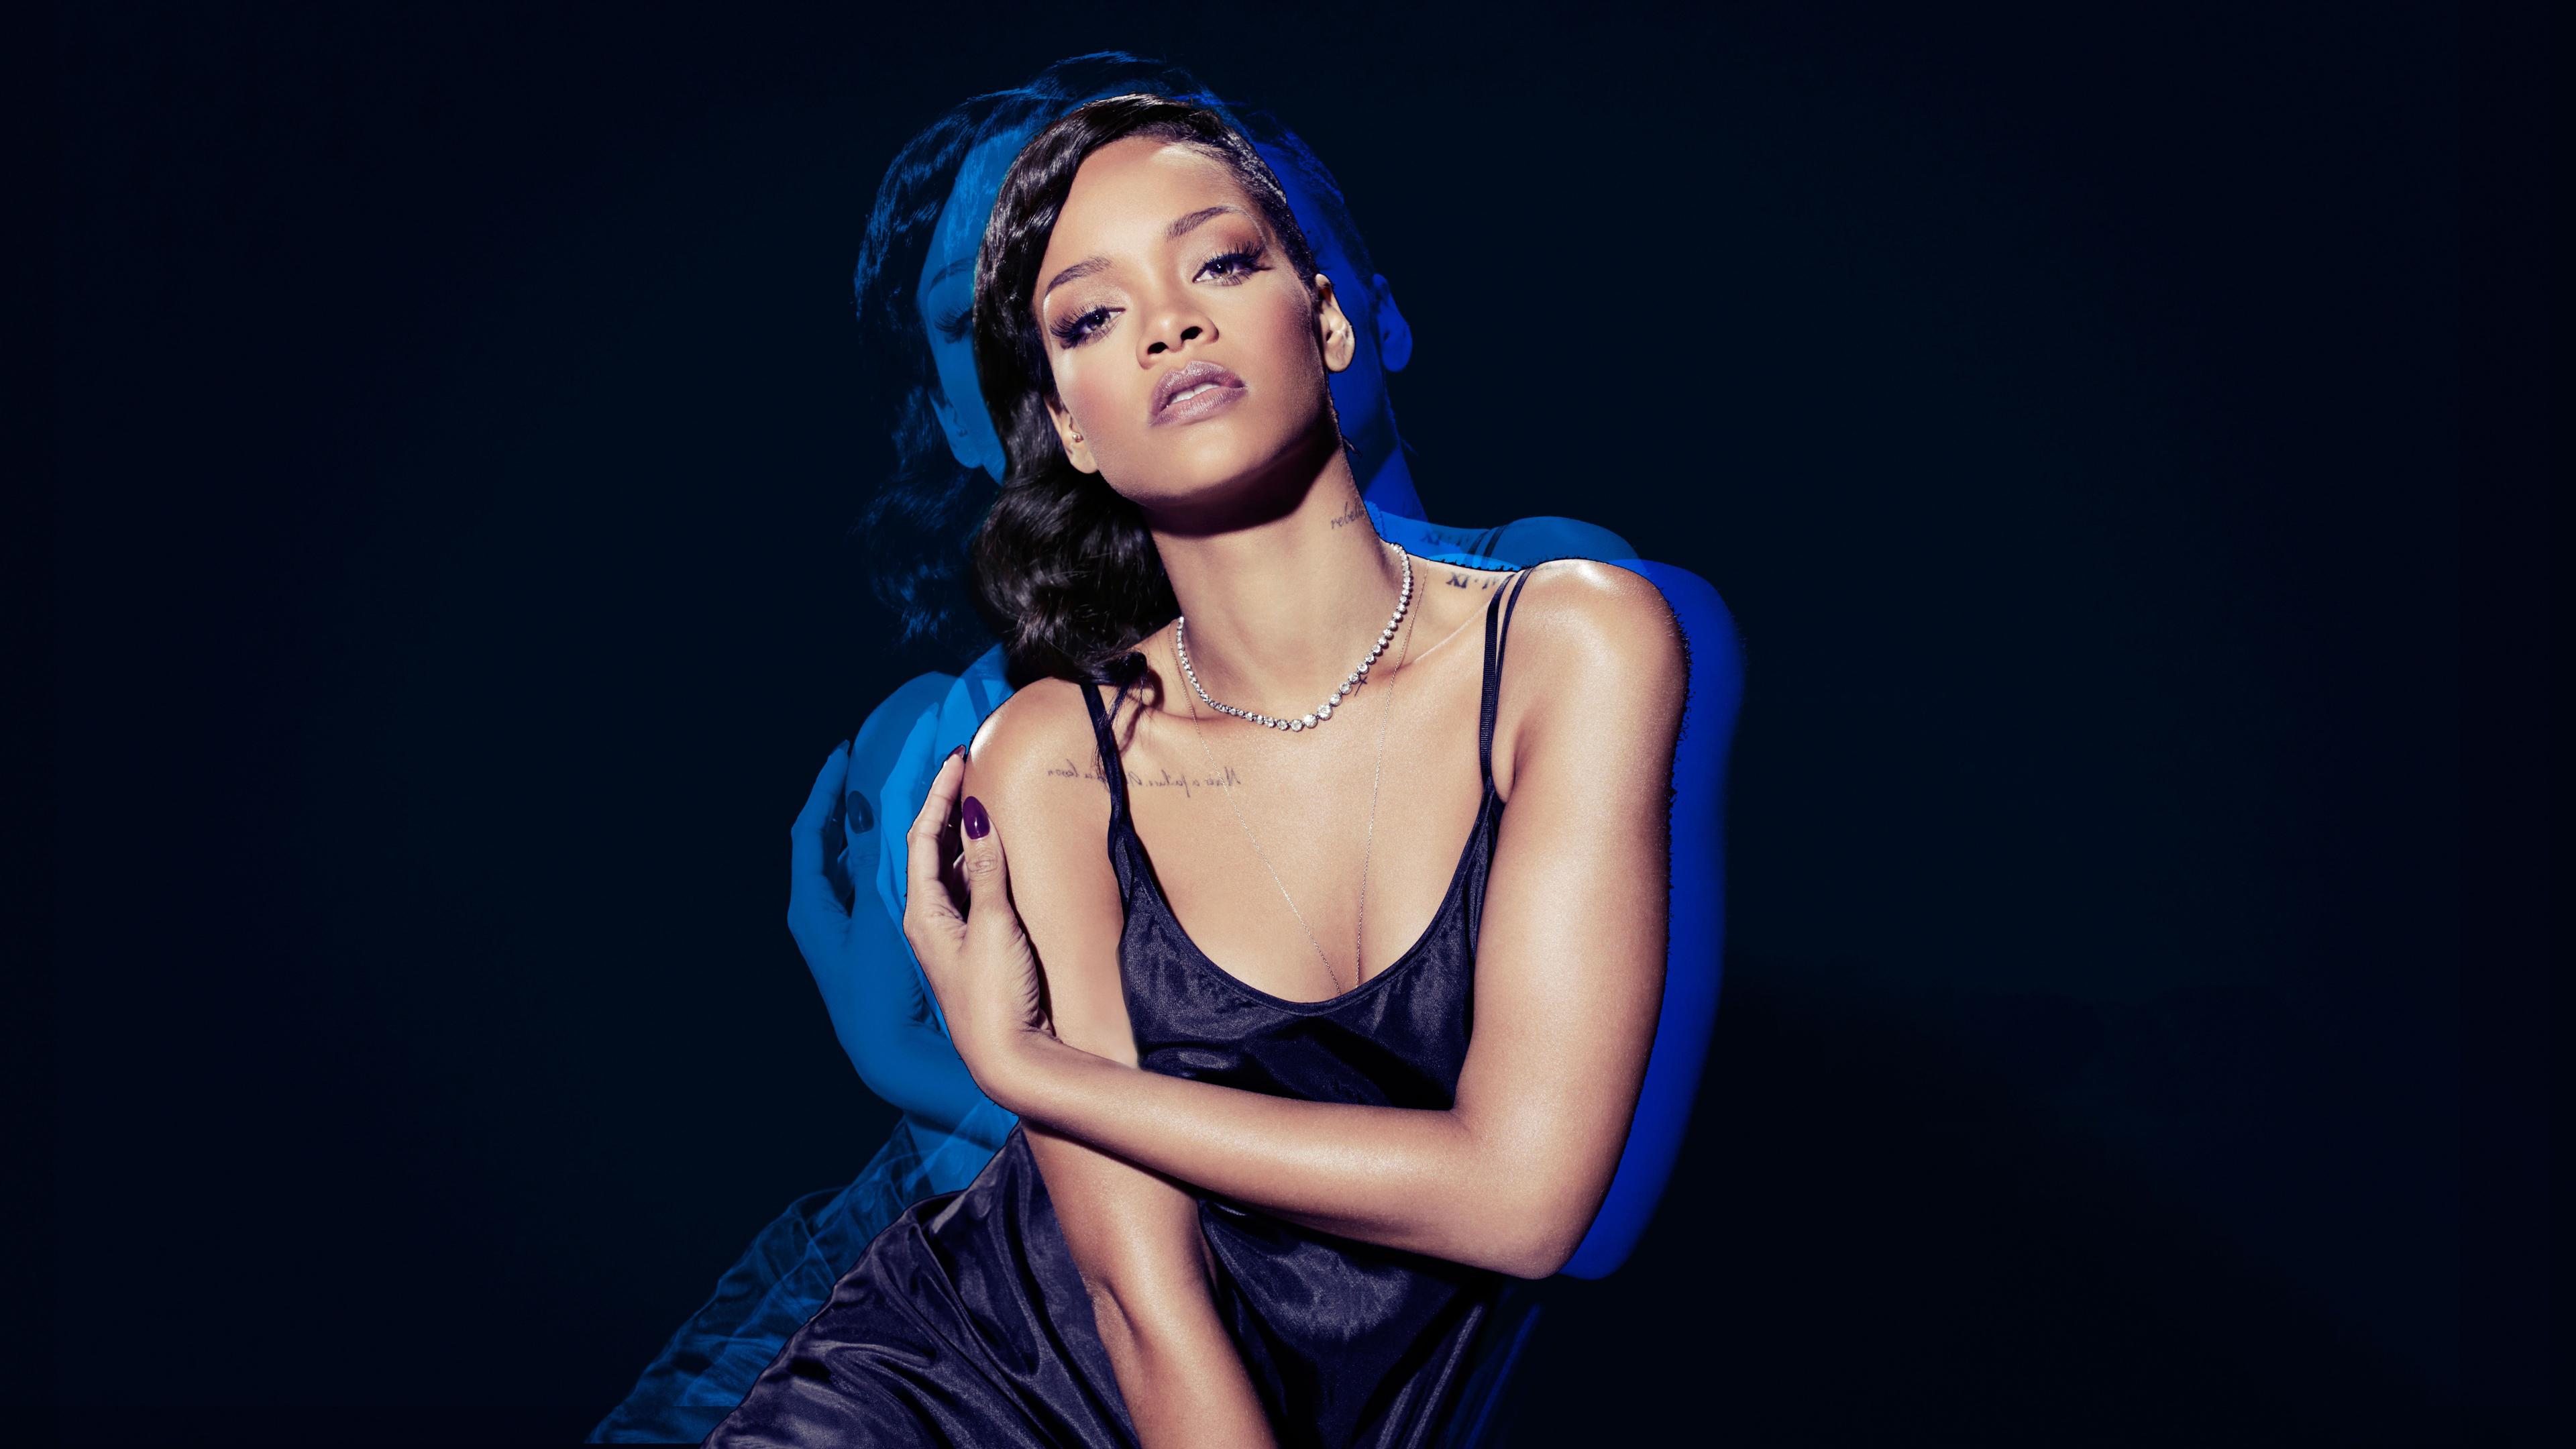 rihanna snl 4k 1546277161 - Rihanna SNL 4k - rihanna wallpapers, music wallpapers, hd-wallpapers, girls wallpapers, celebrities wallpapers, 4k-wallpapers